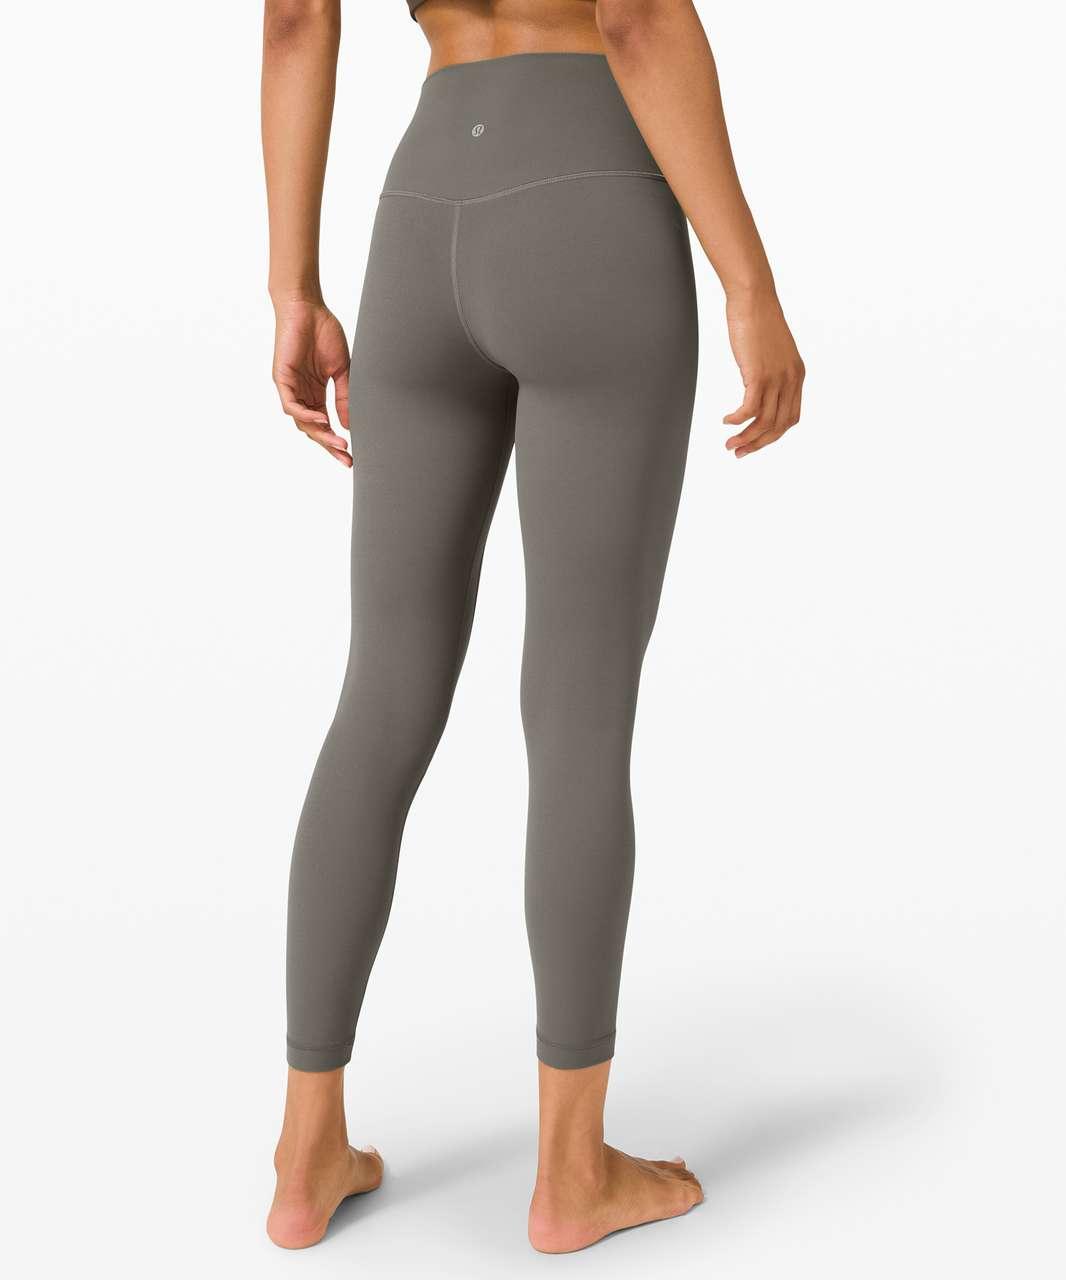 "Lululemon Align Pant II 25"" - Grey Sage"